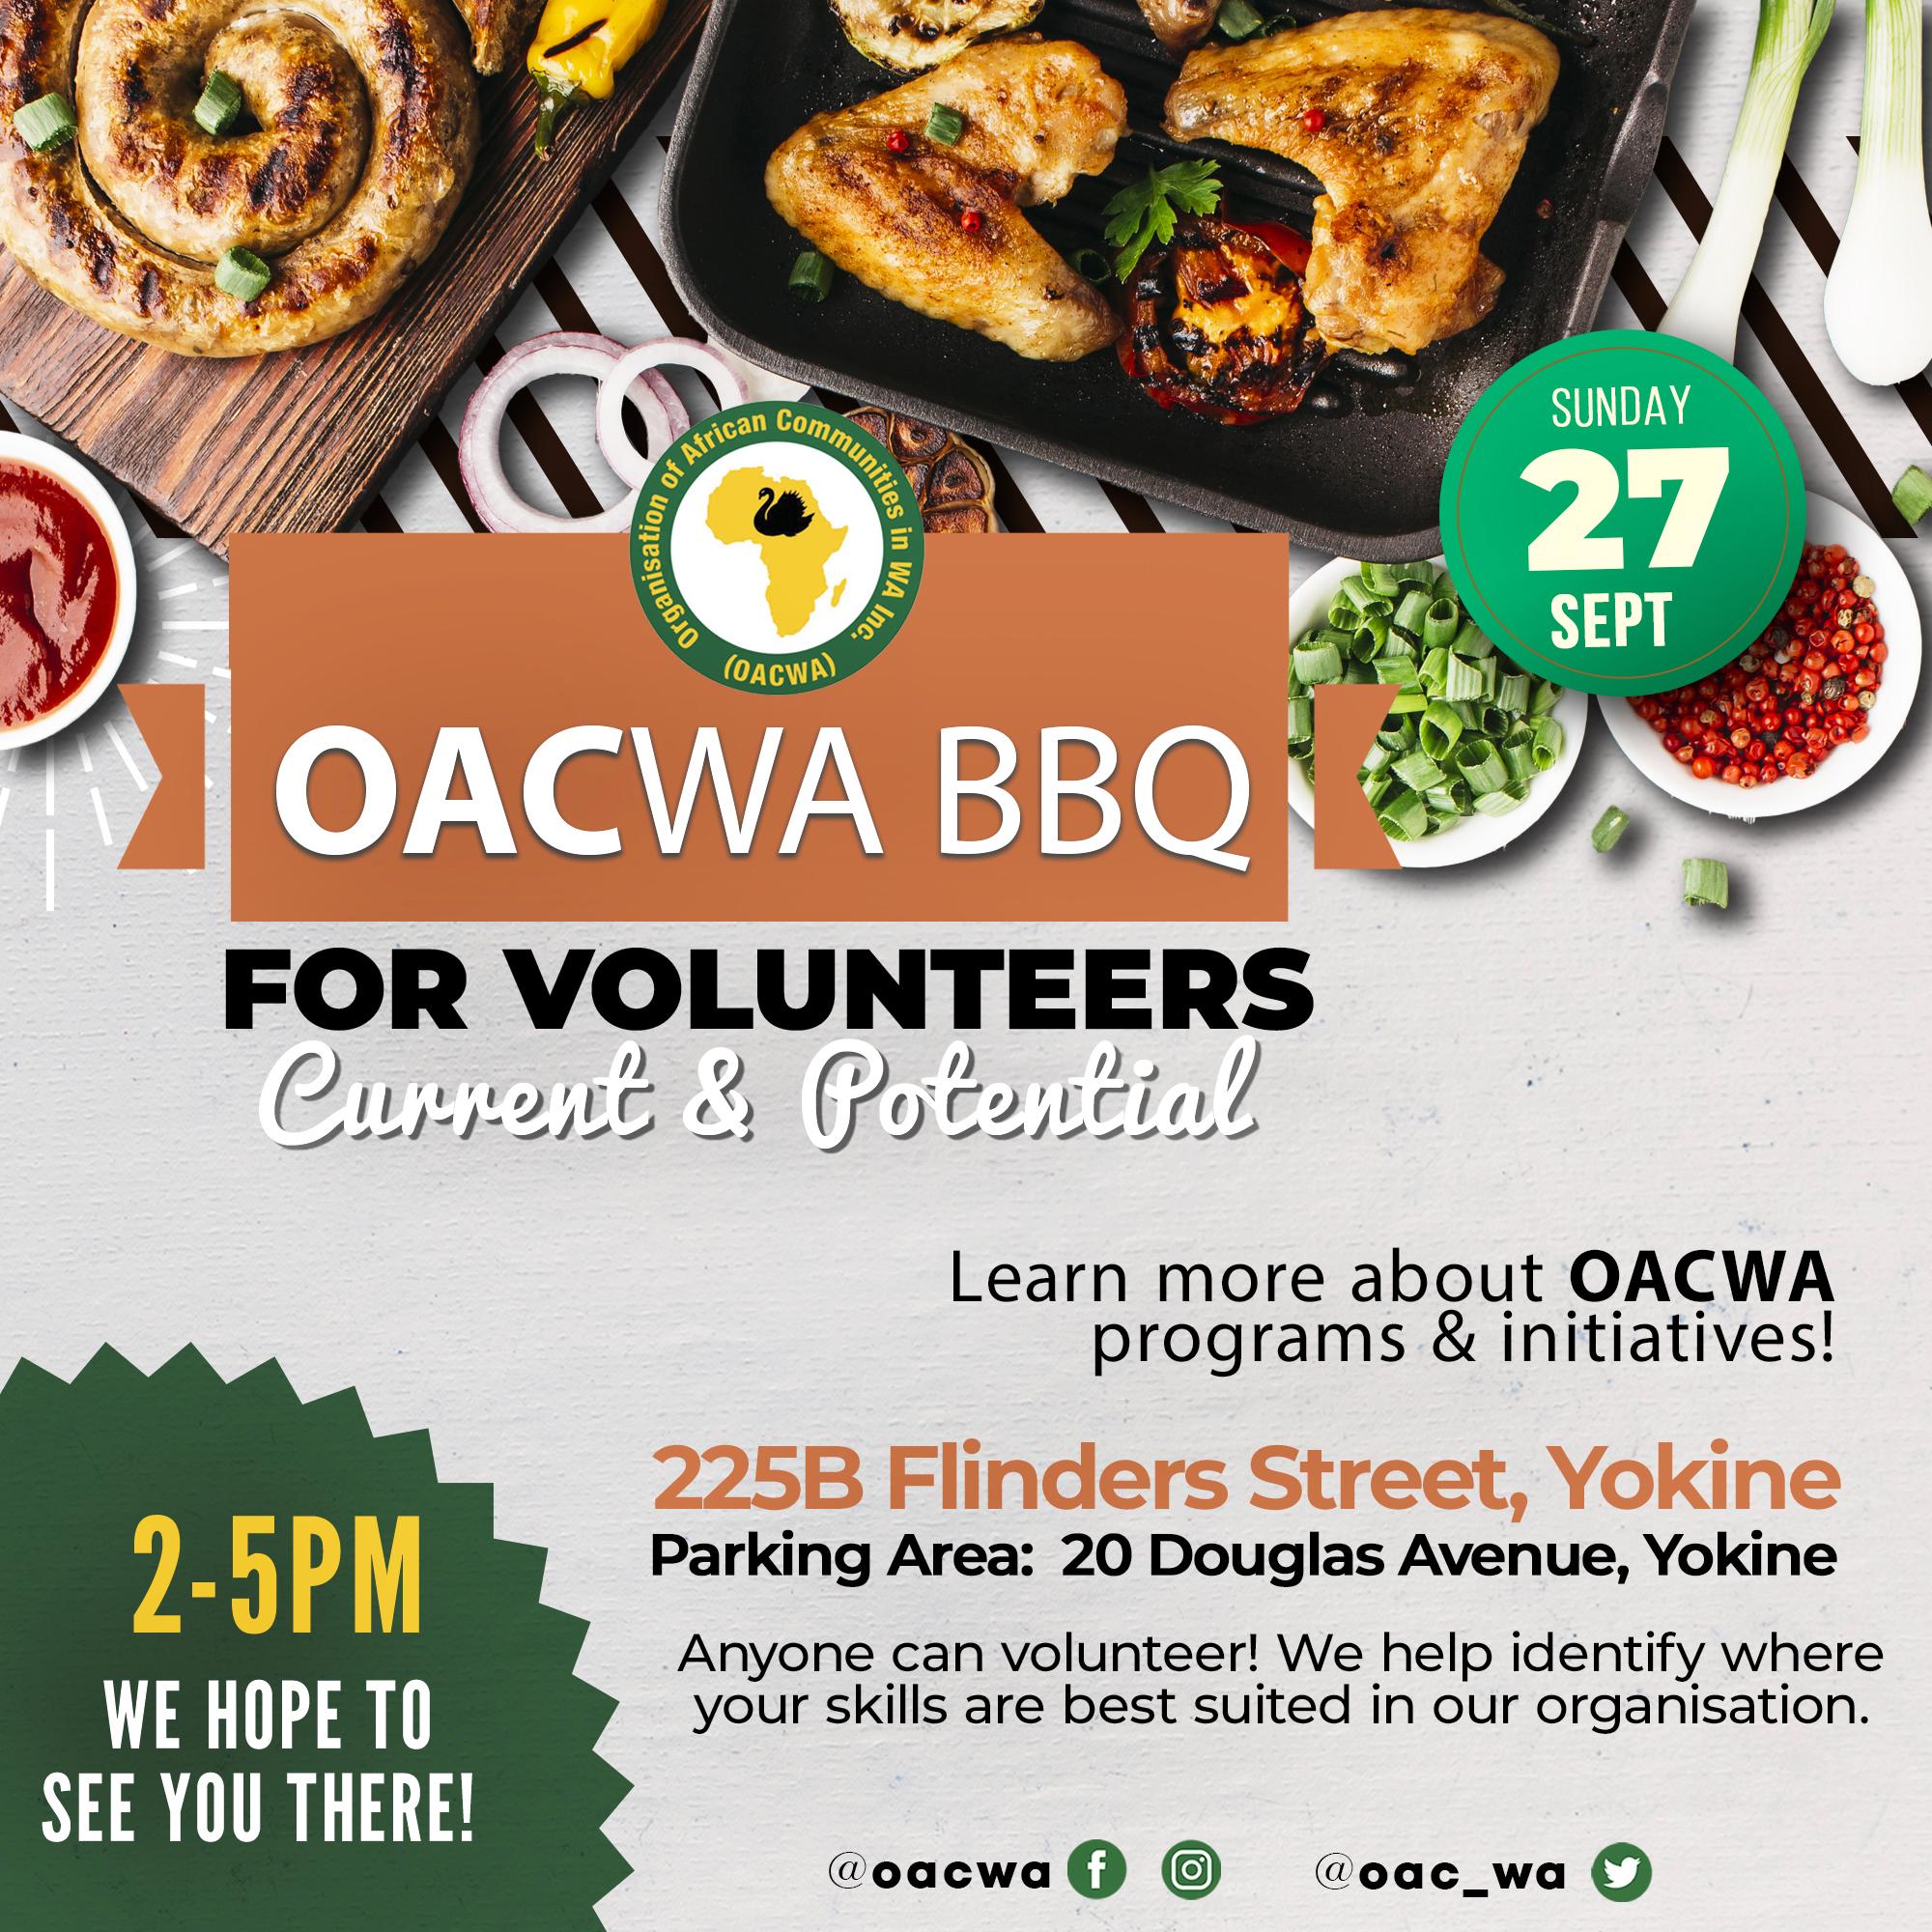 oacwa-bbq-flyer